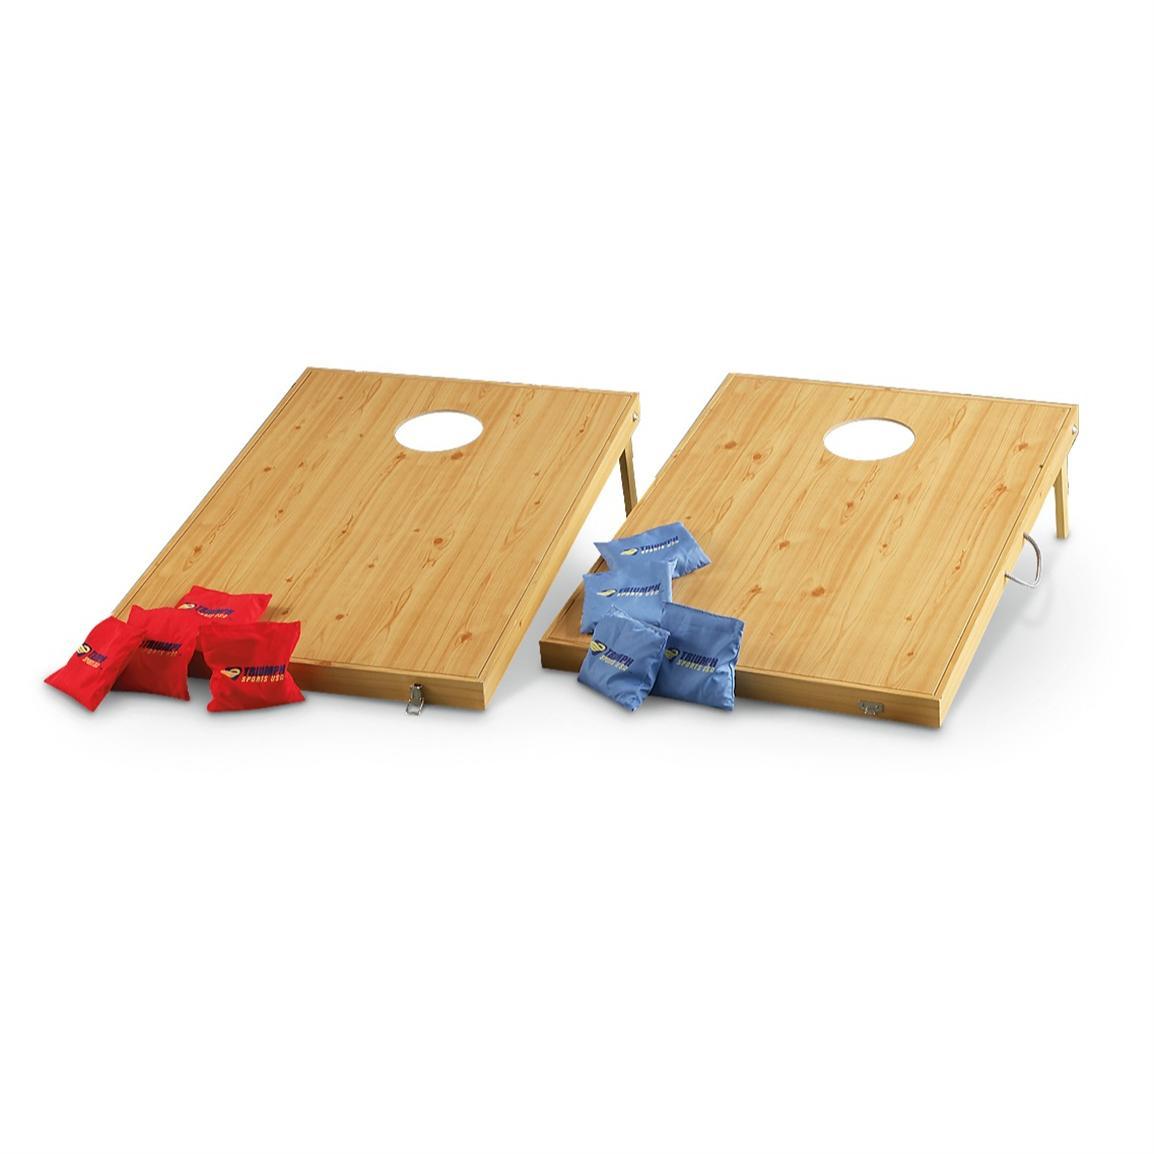 wooden cornhole board game